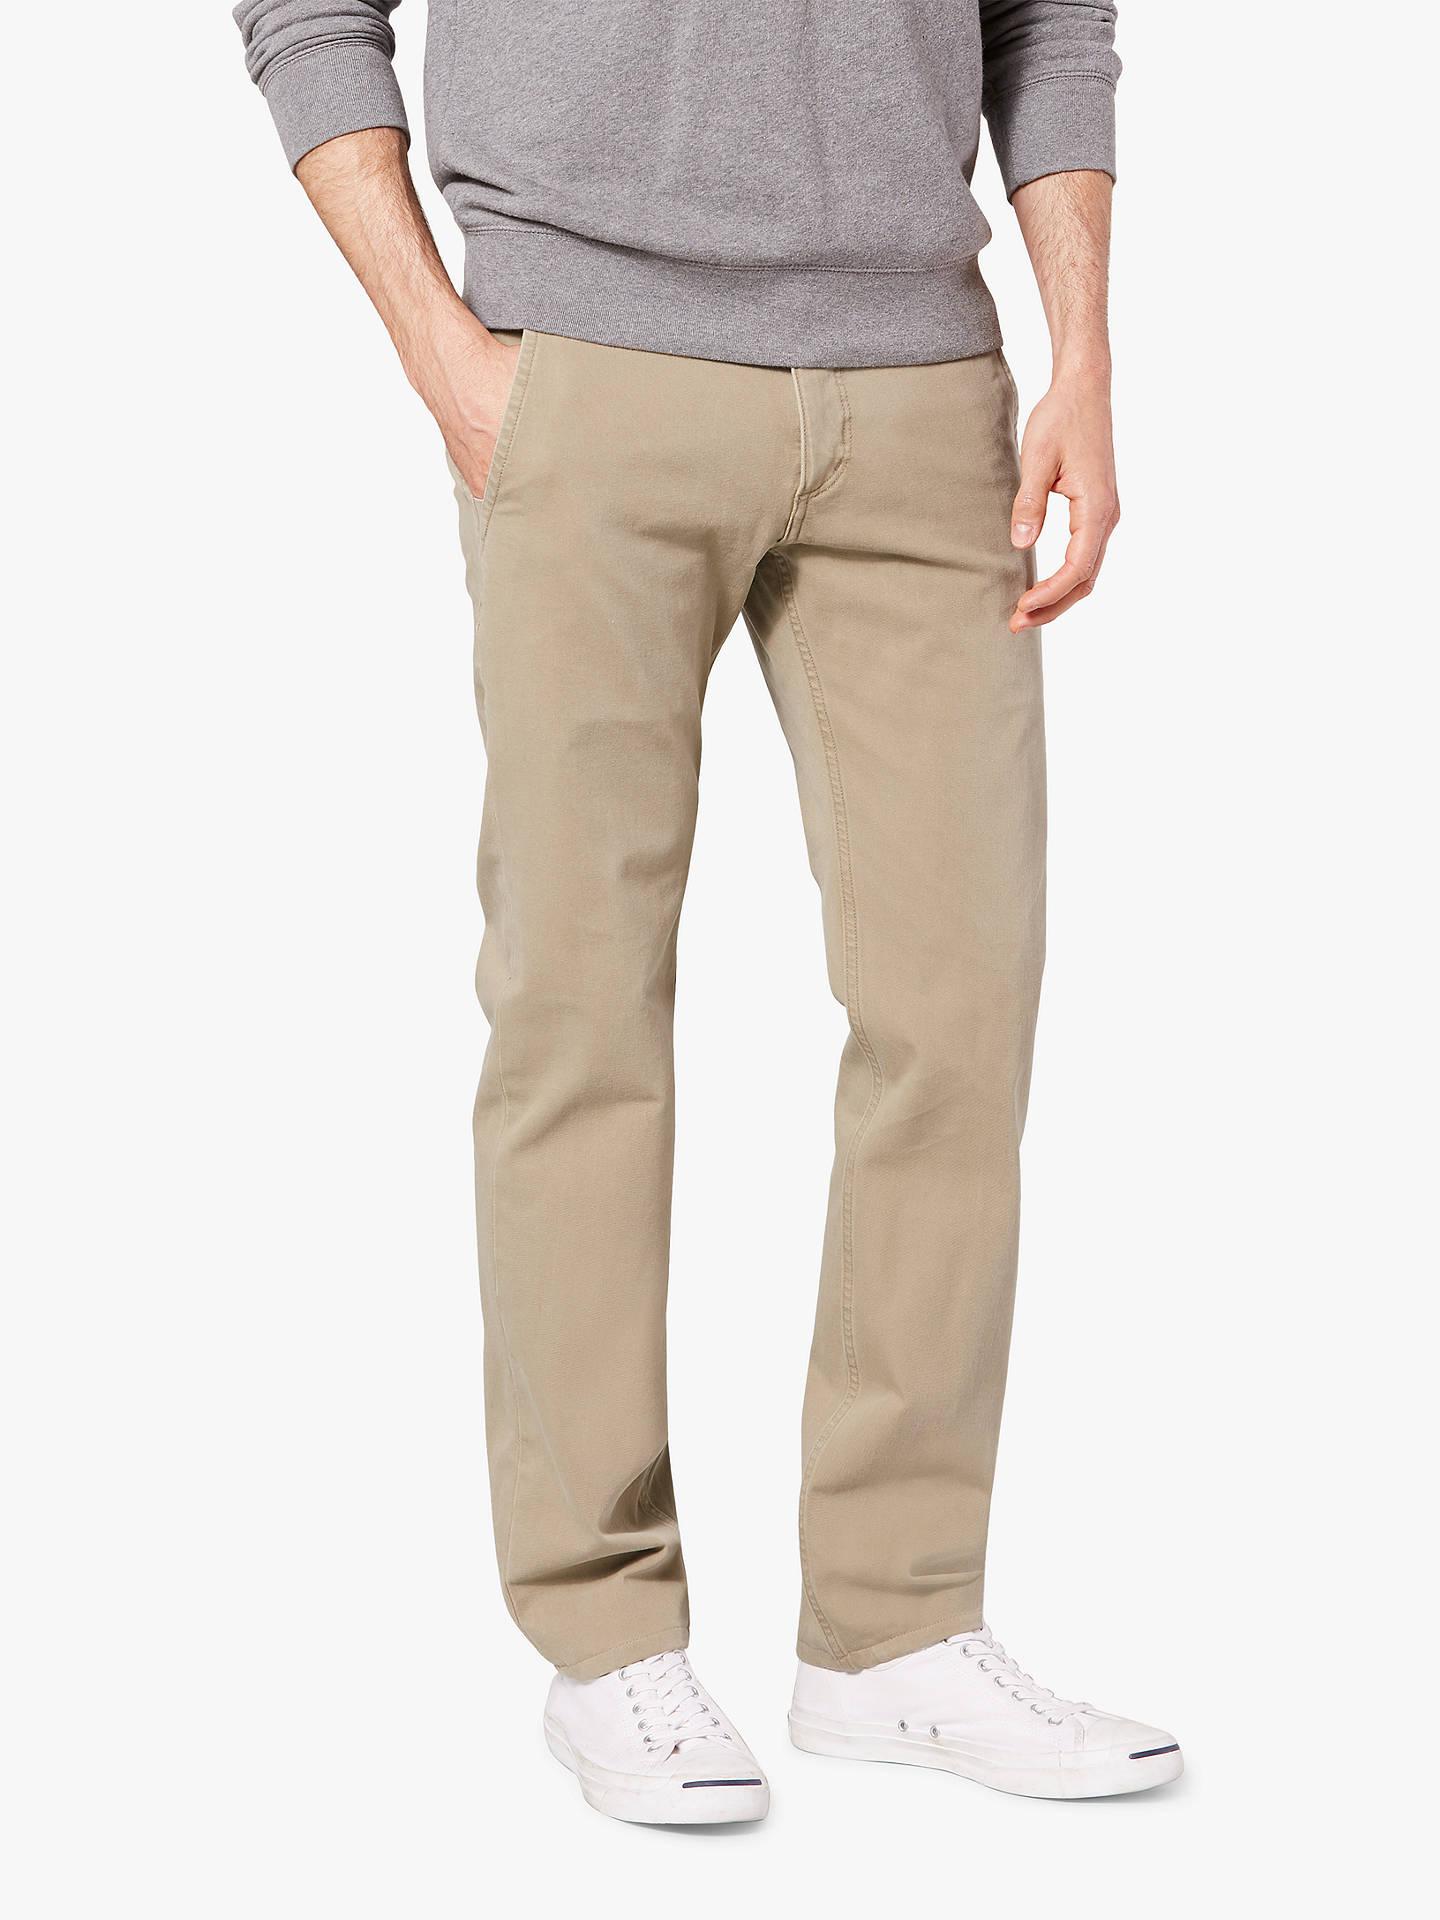 a4cde824d6e054 ... Buy Dockers Alpha Khaki Smart 360 Flex Slim Tapered Trousers, New  British Khaki, 32S ...